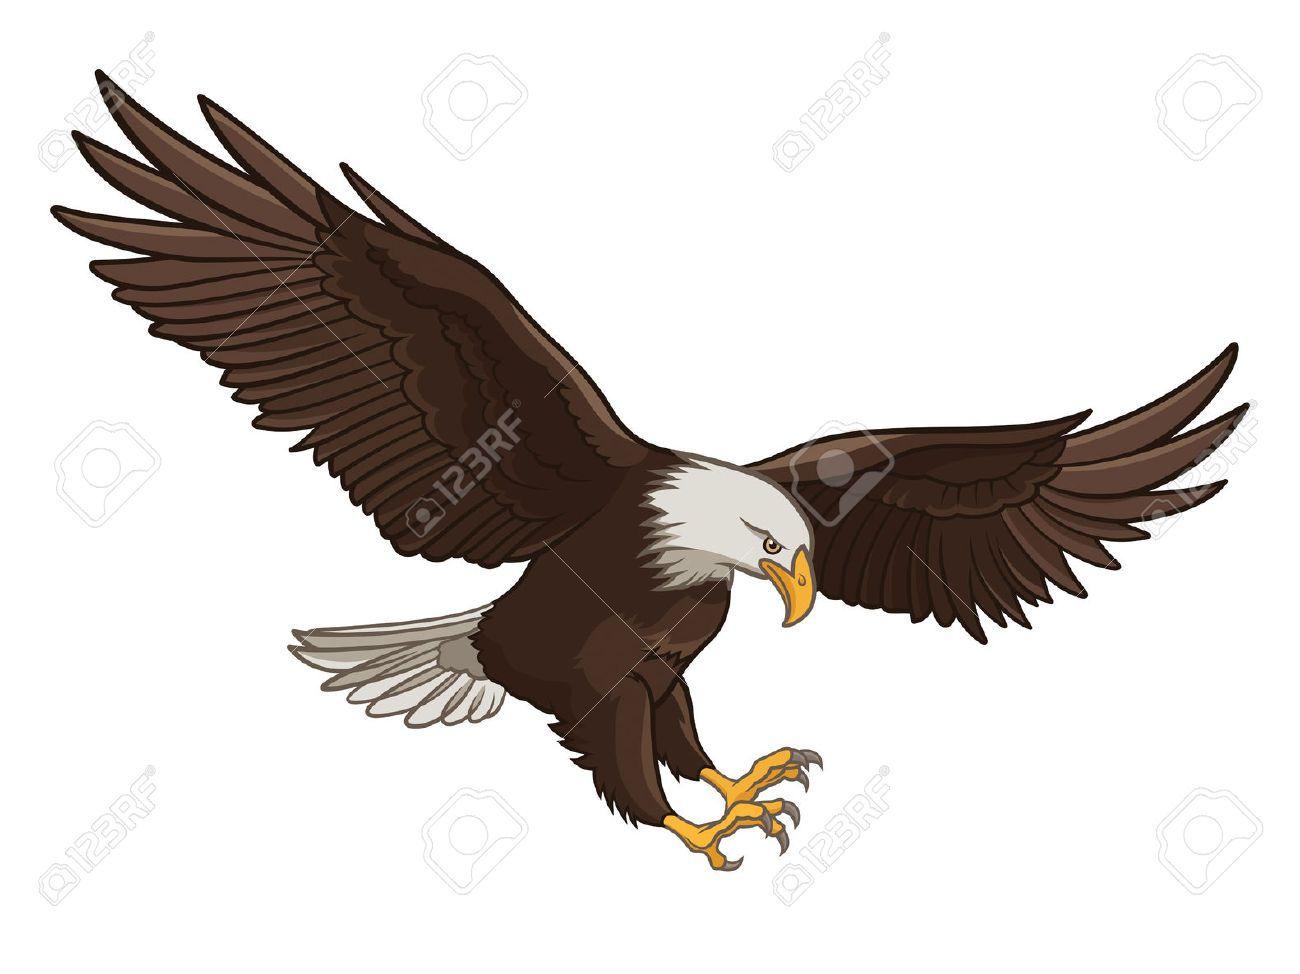 Vector illustration of a. Eagle clipart eagle flying